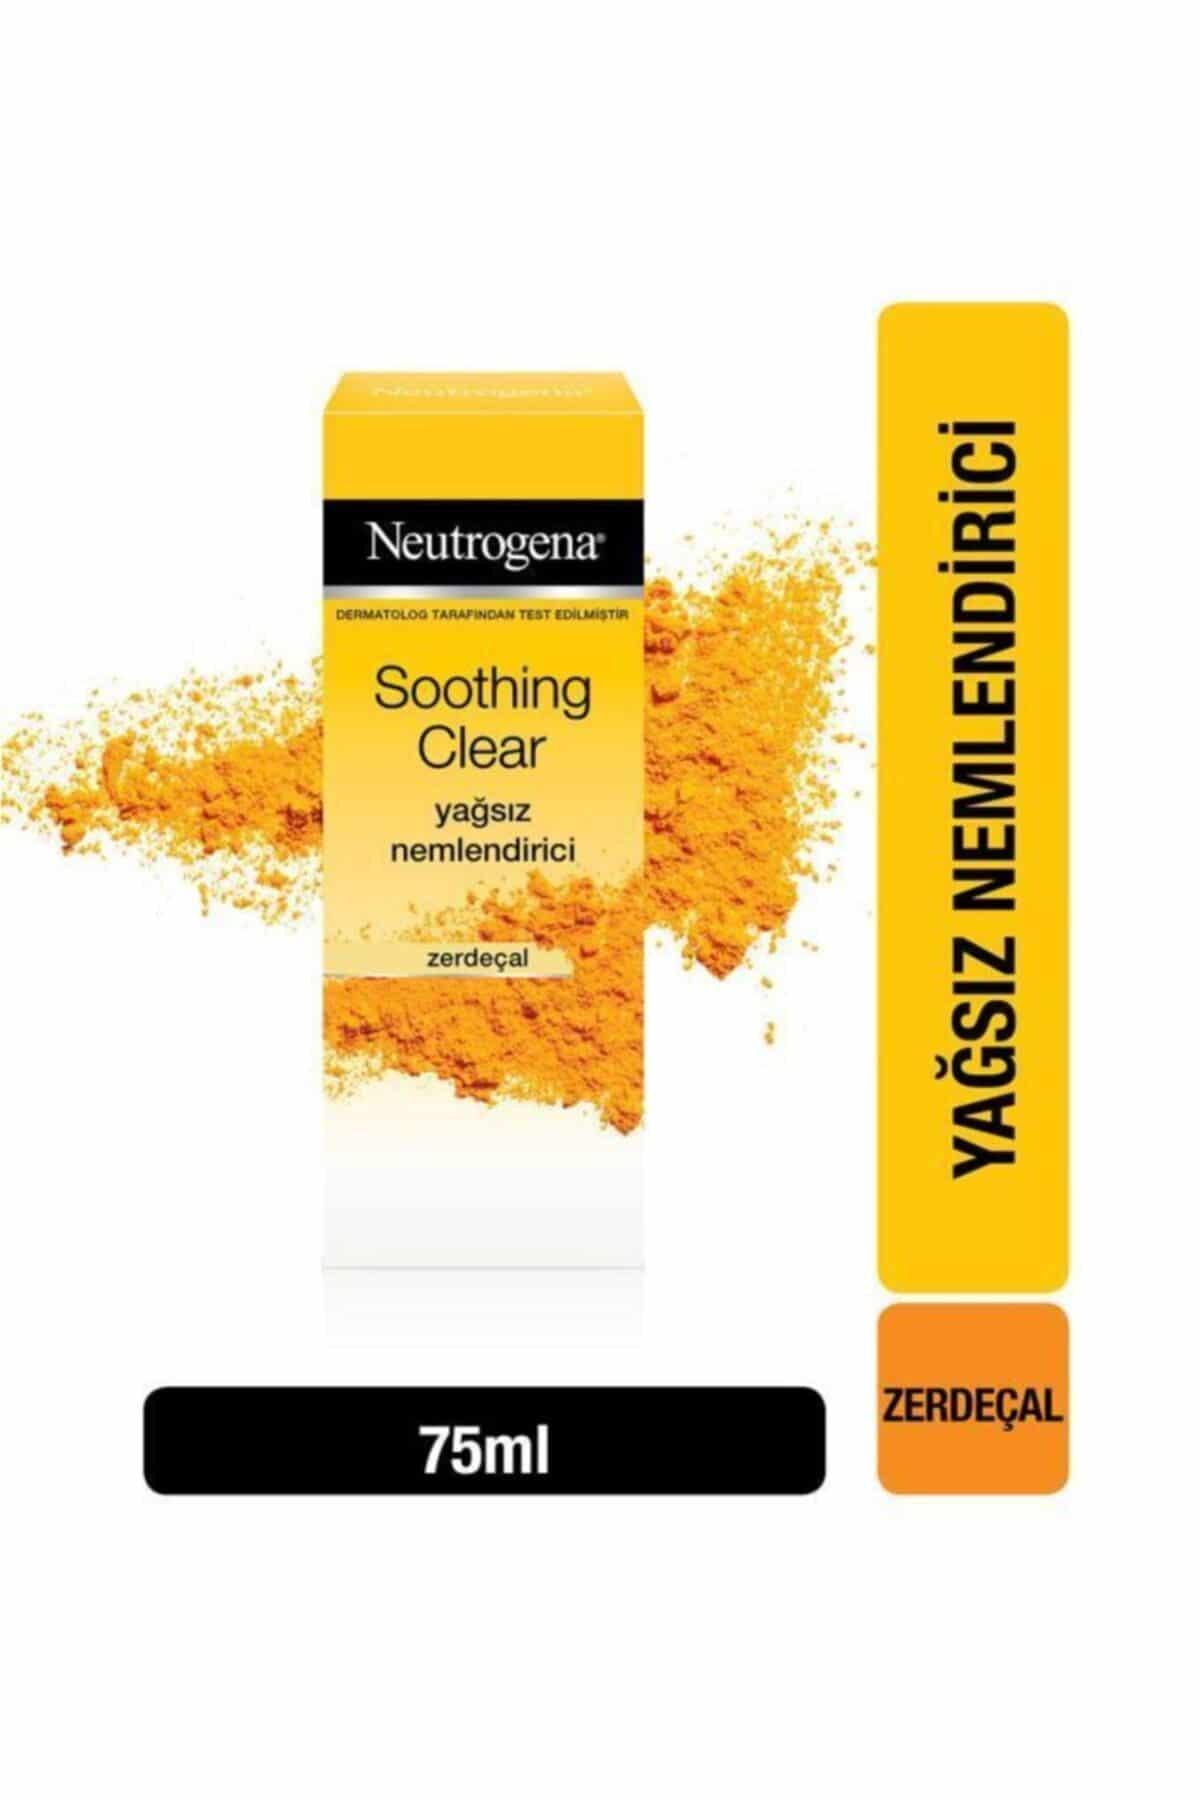 Hassas Cilt İçin En İyi: Neutrogena Soothing Clear Nemlendirici 75 ml